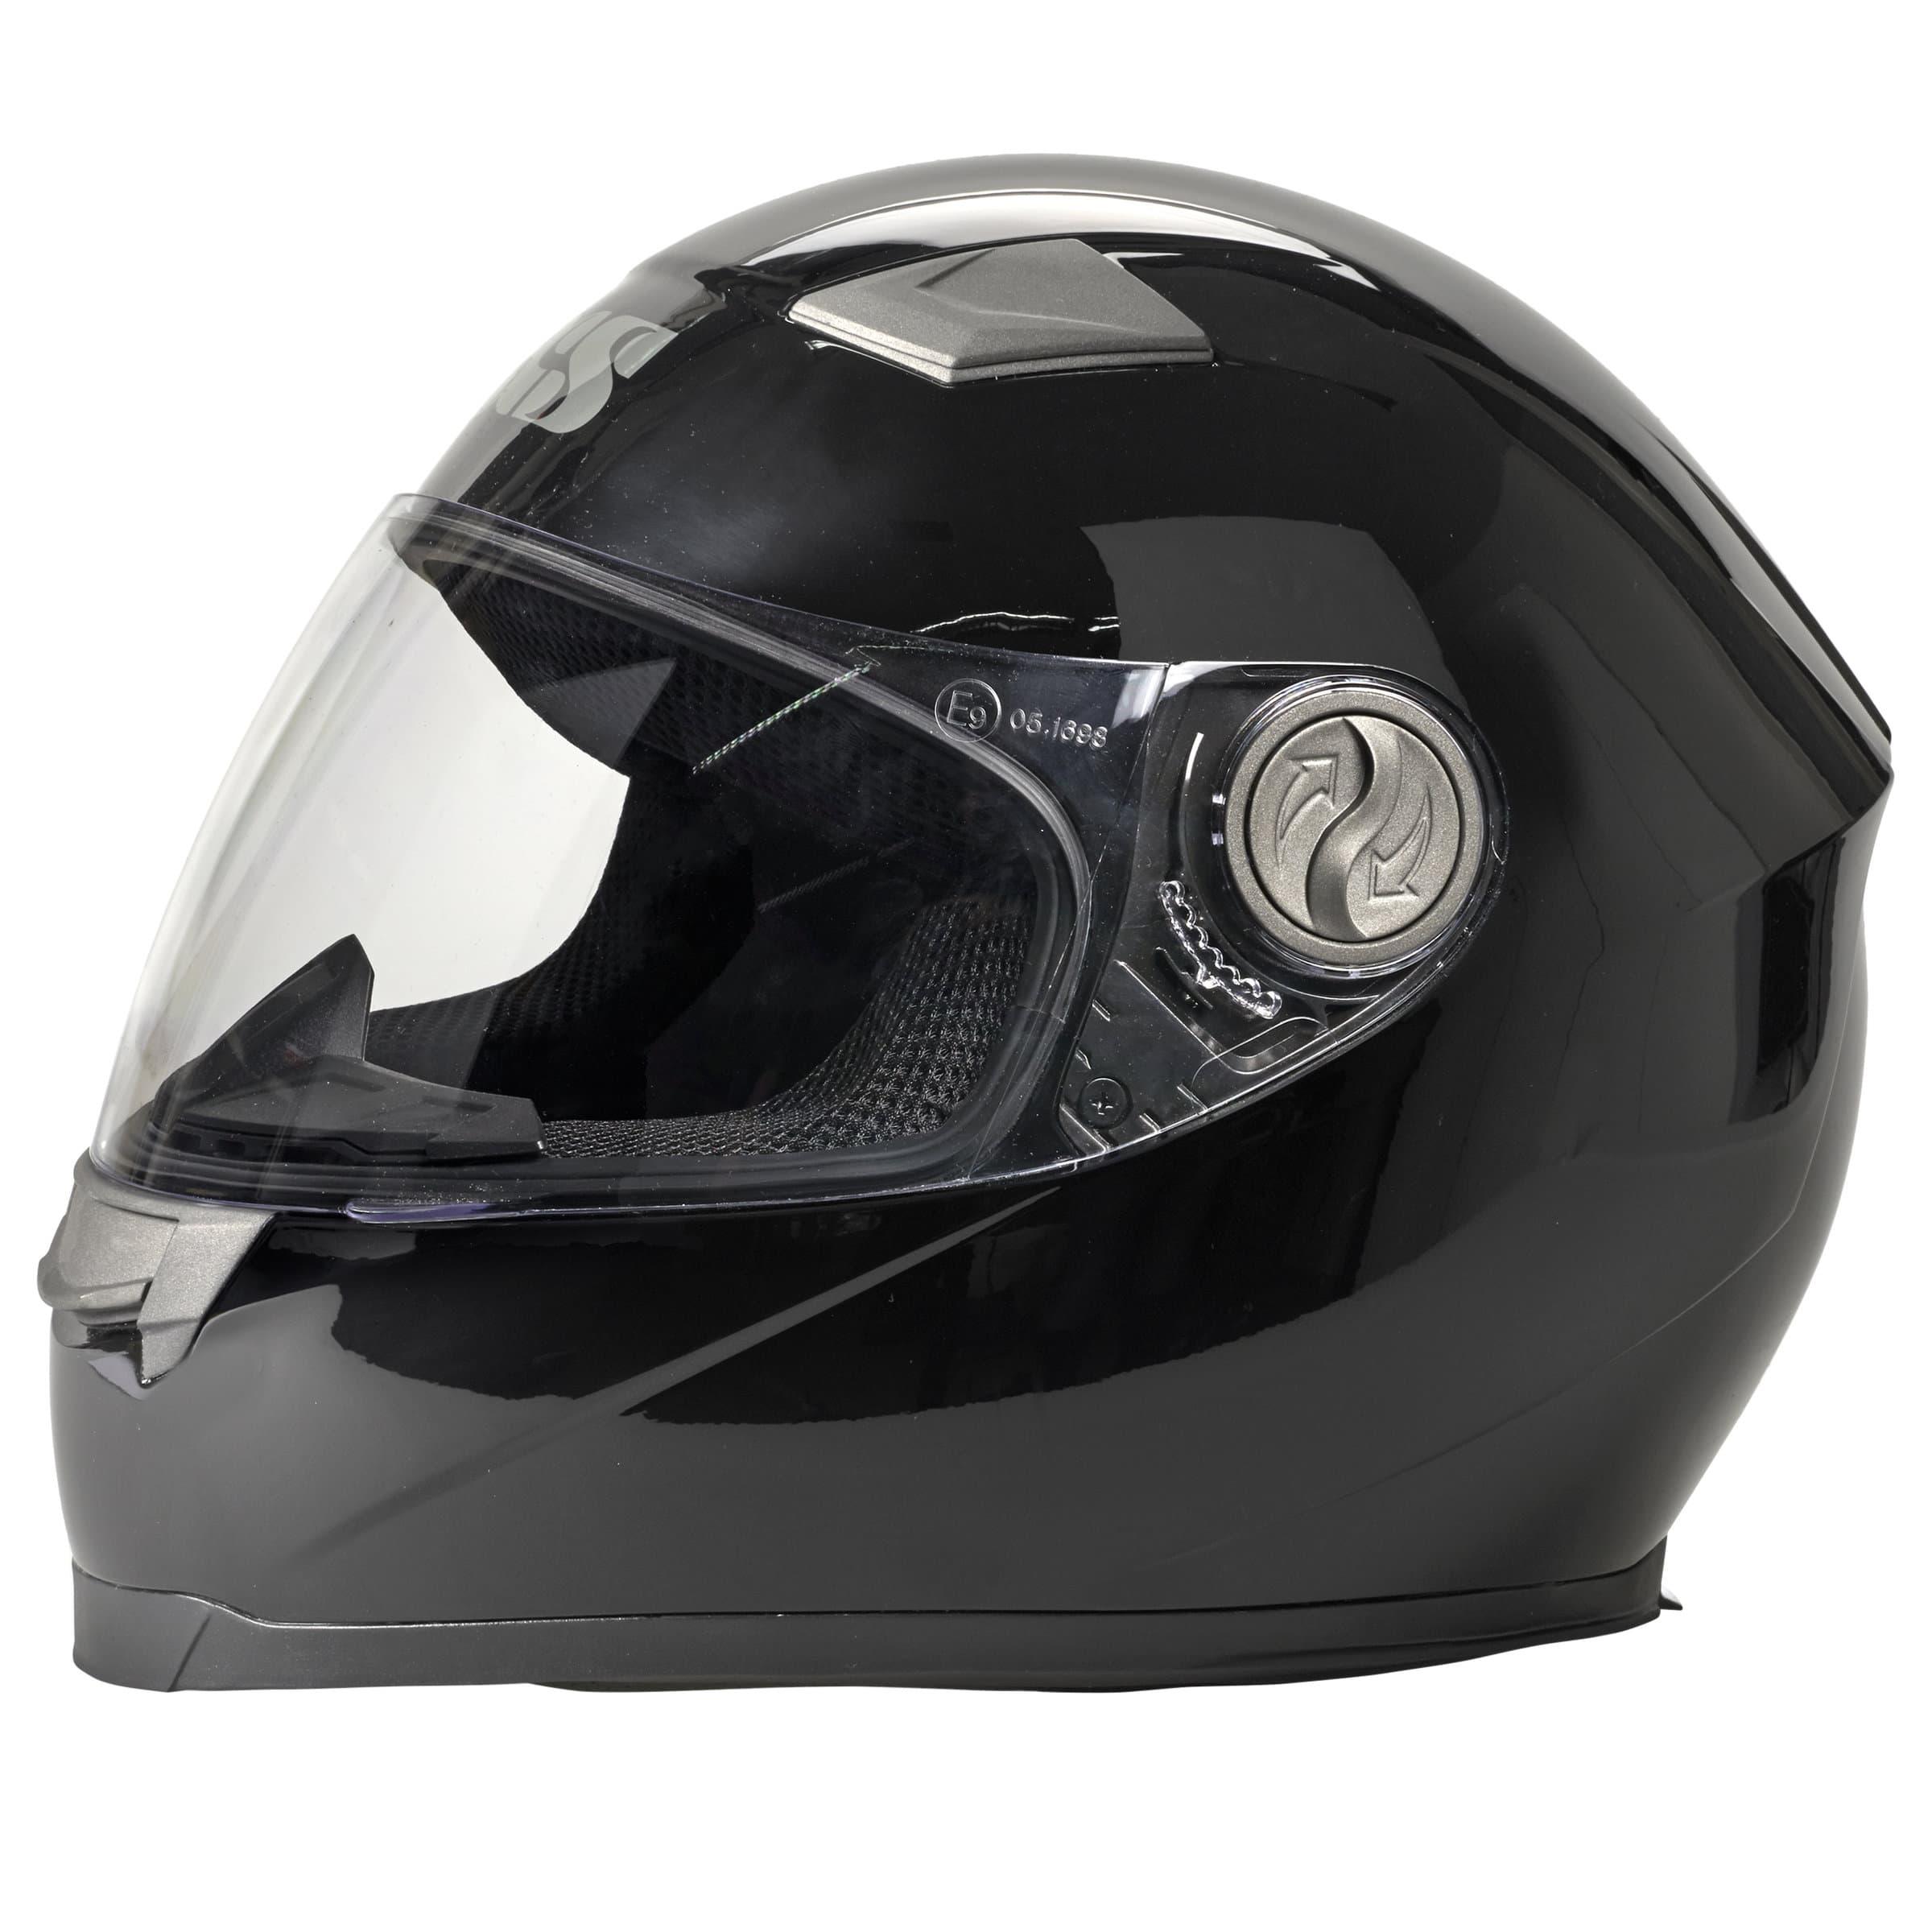 iXS HX 2500 Motorrad-Integralhelm